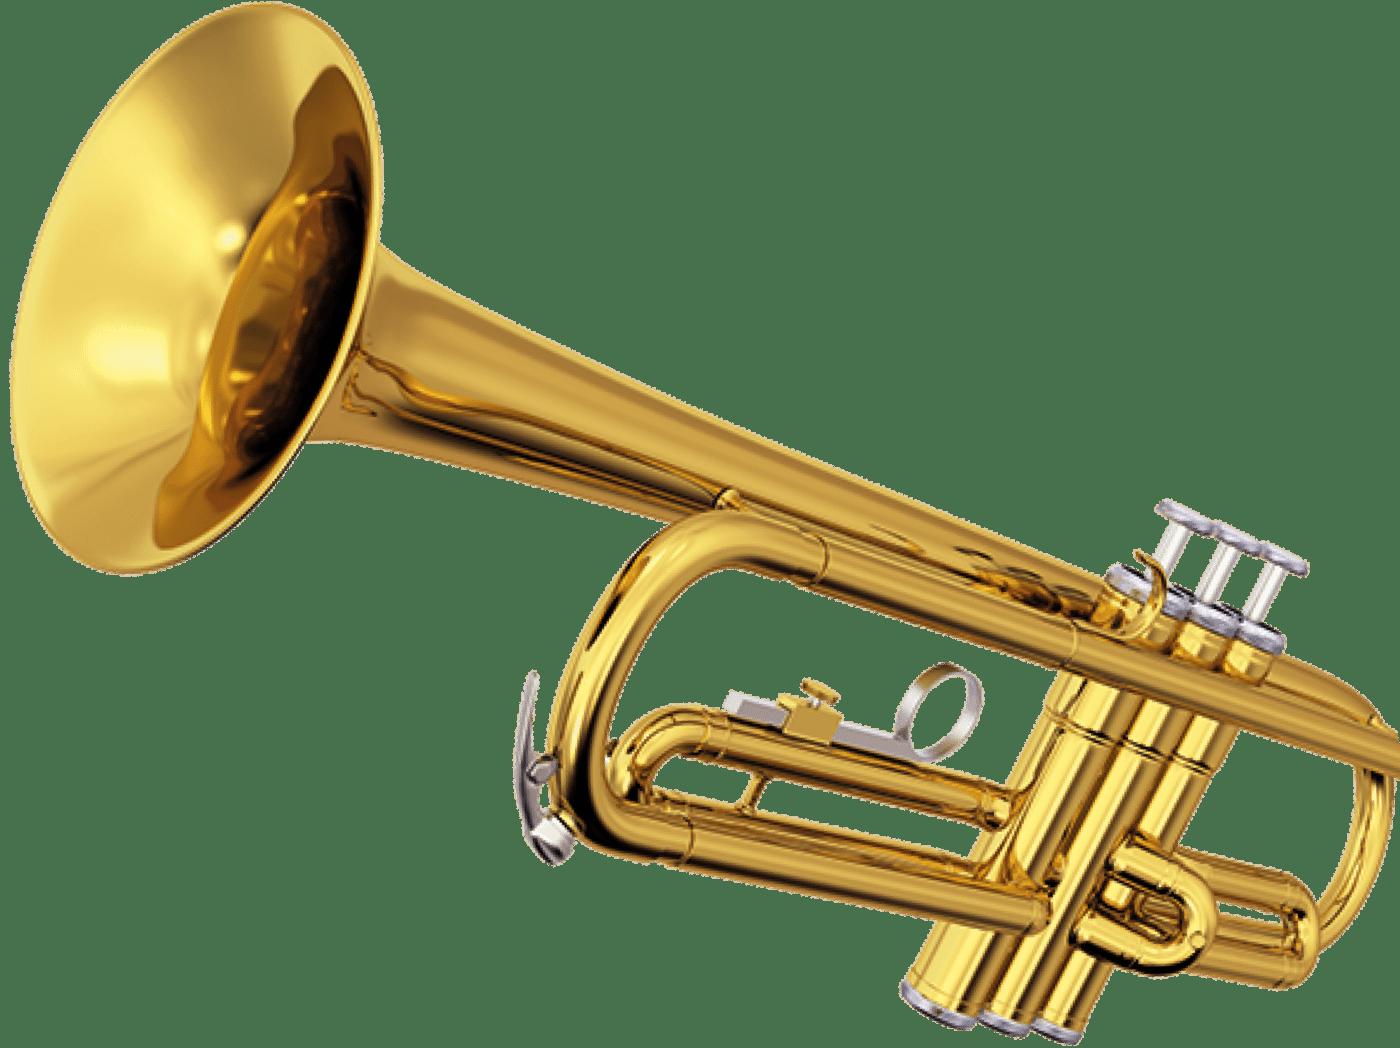 award trumpet